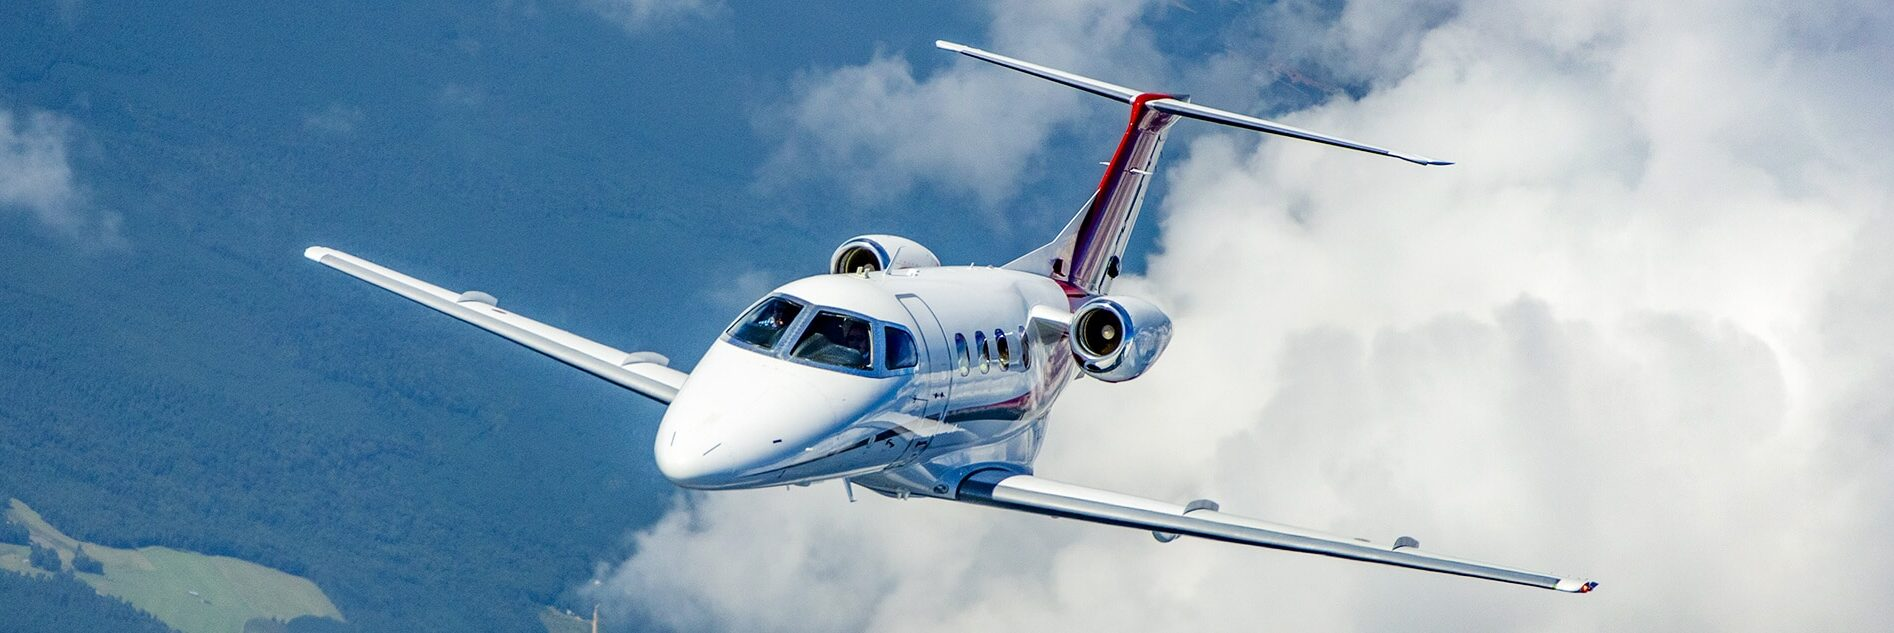 Embraer Phenom 100 Aerial